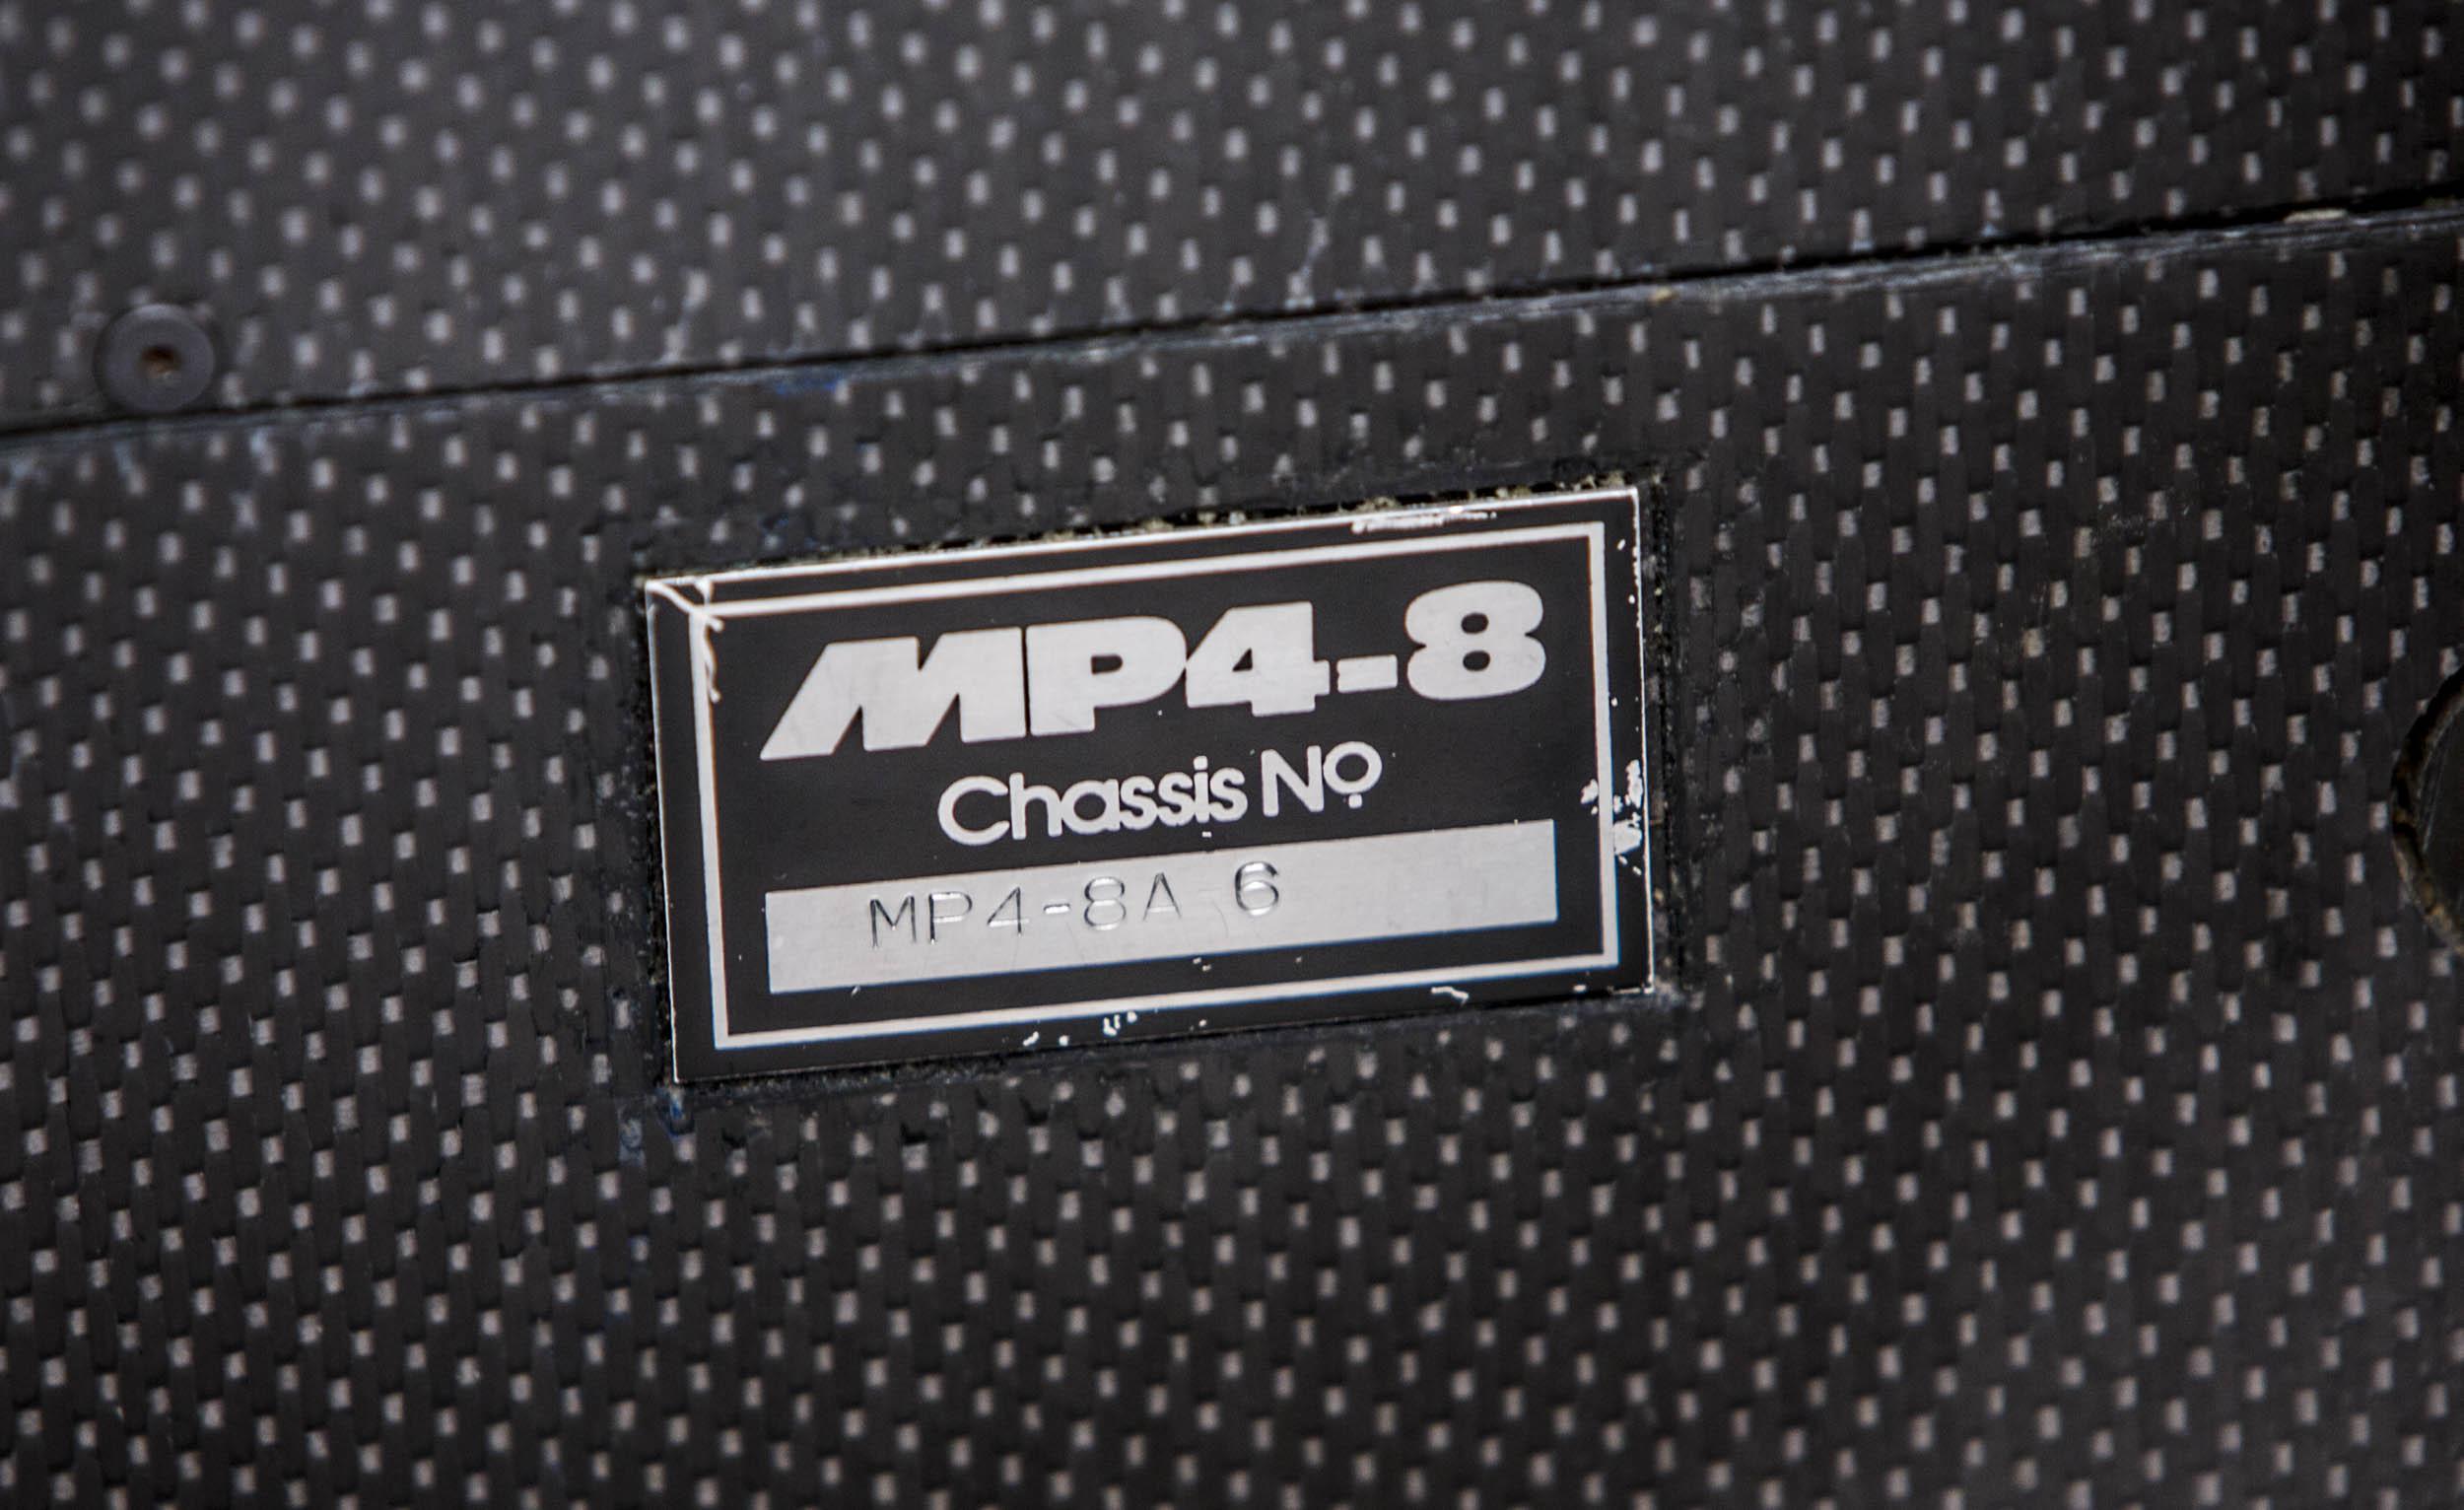 McLaren MP4/8A badge